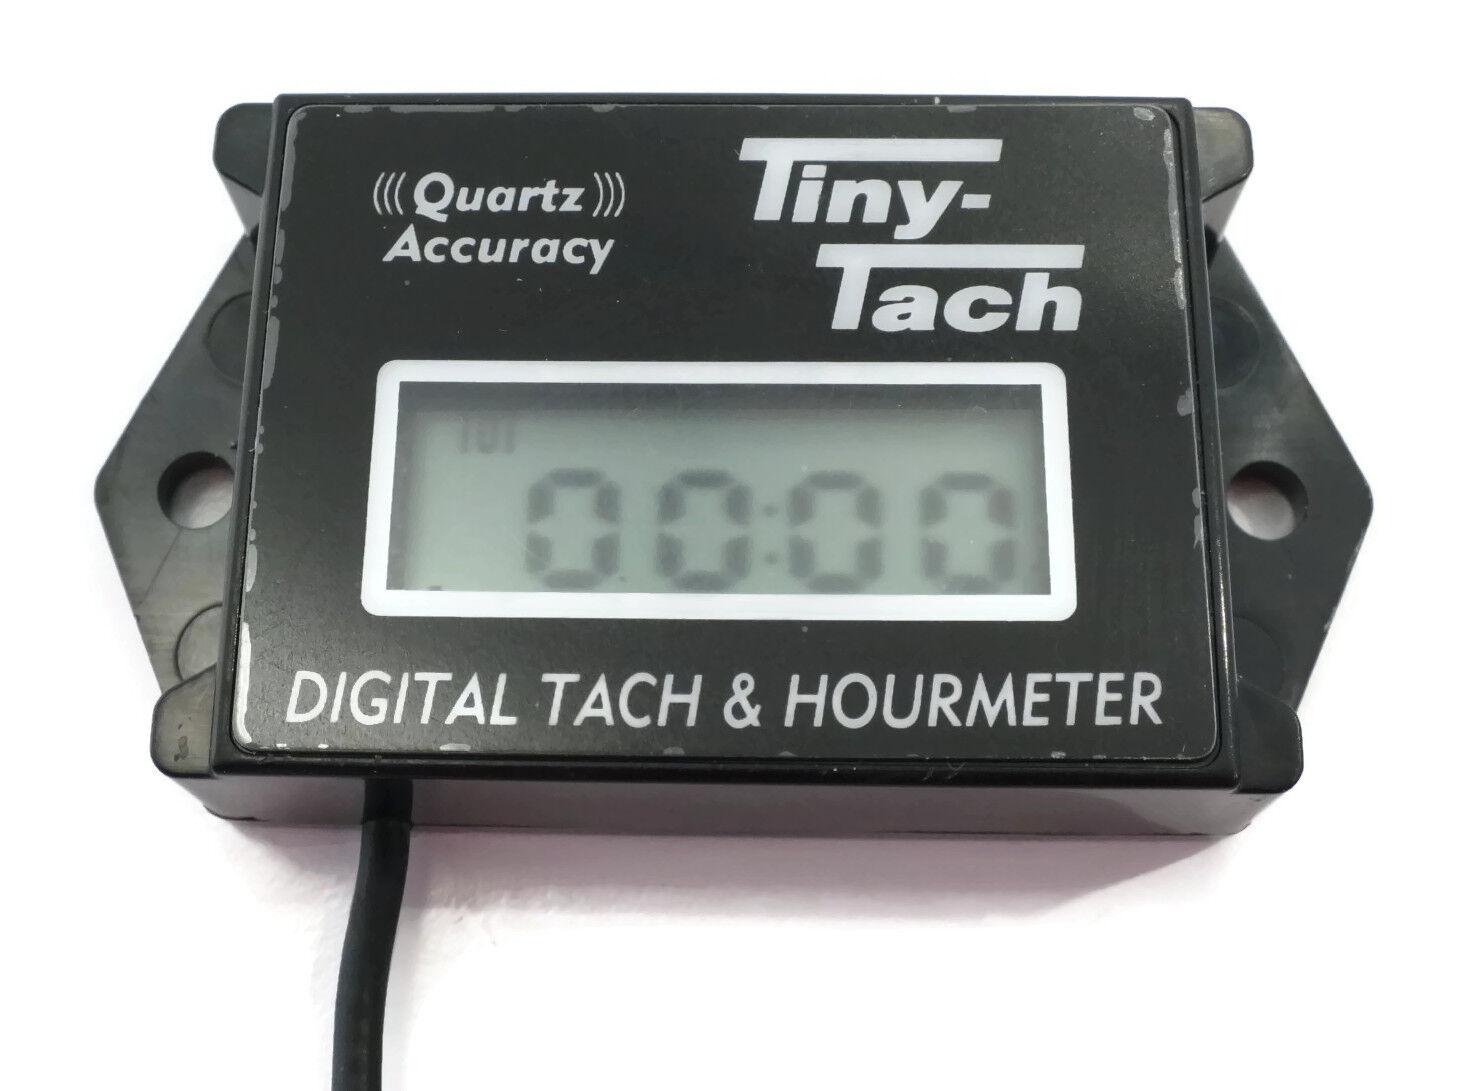 Details about Tiny Tach, TT2B Digital Hour Meter / Tachometer for Briggs &  Stratton, Kohler